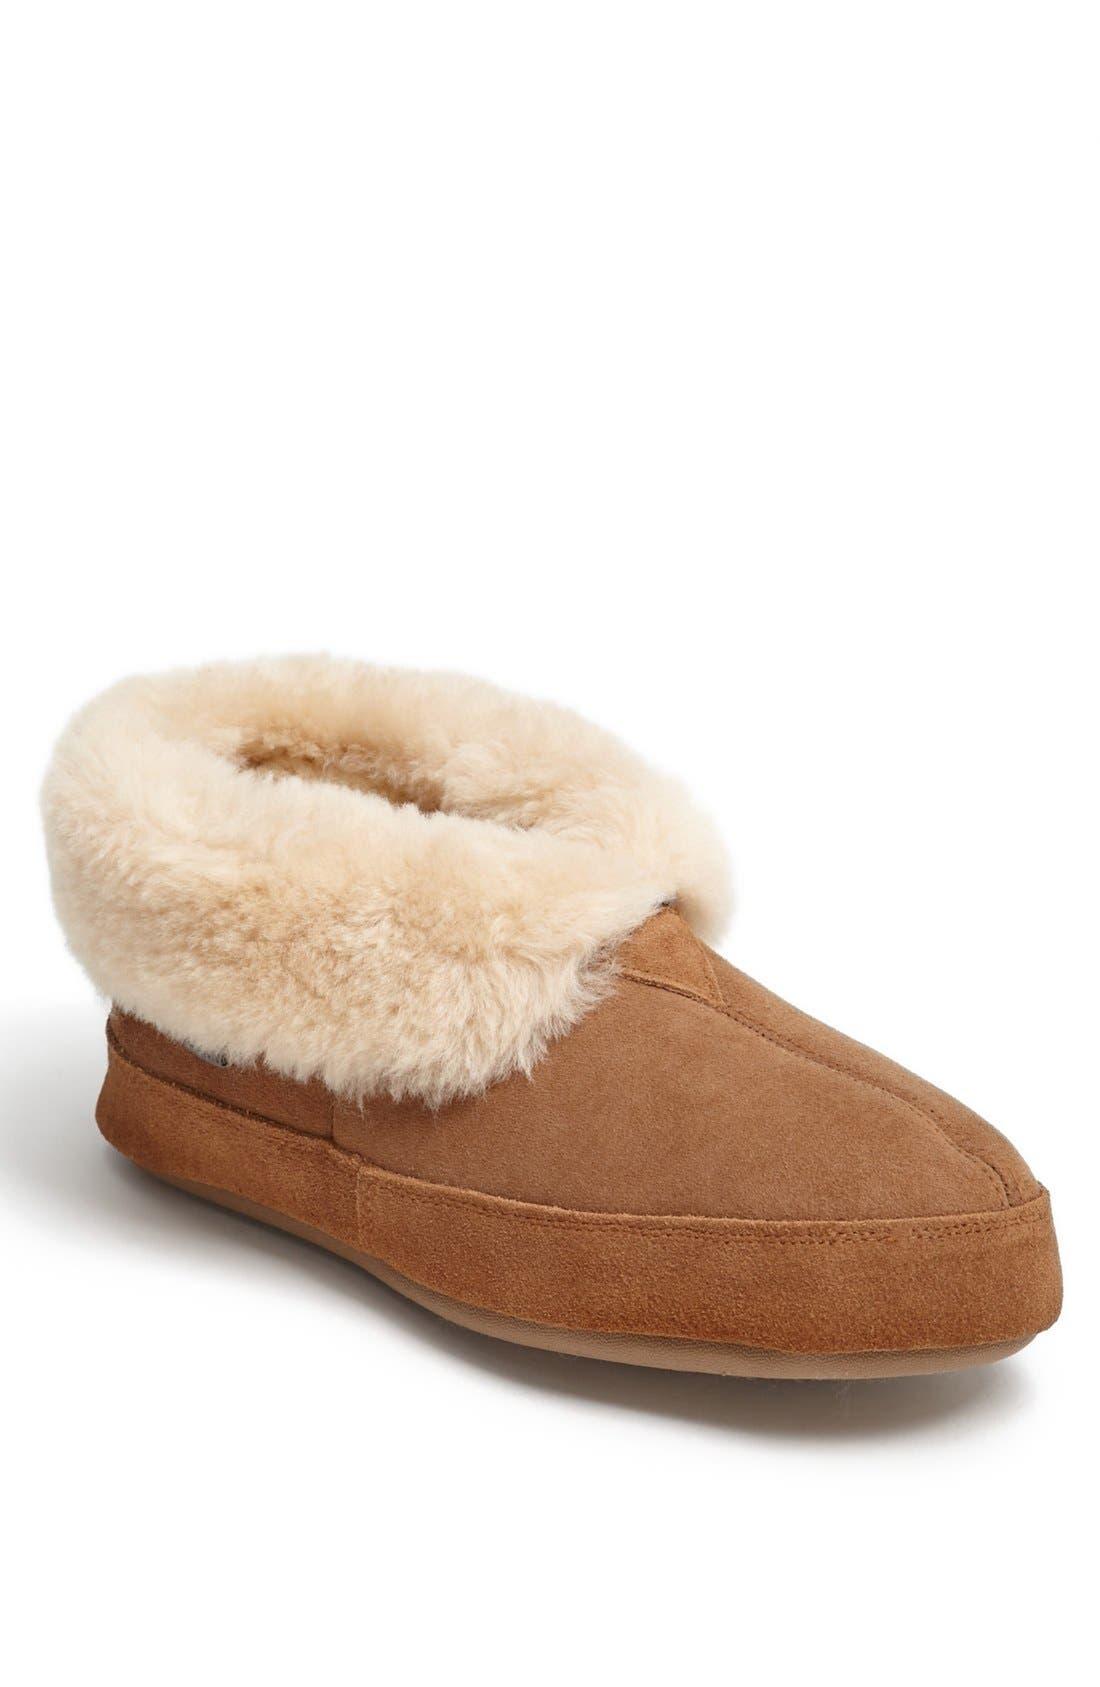 Genuine Sheepskin Slipper